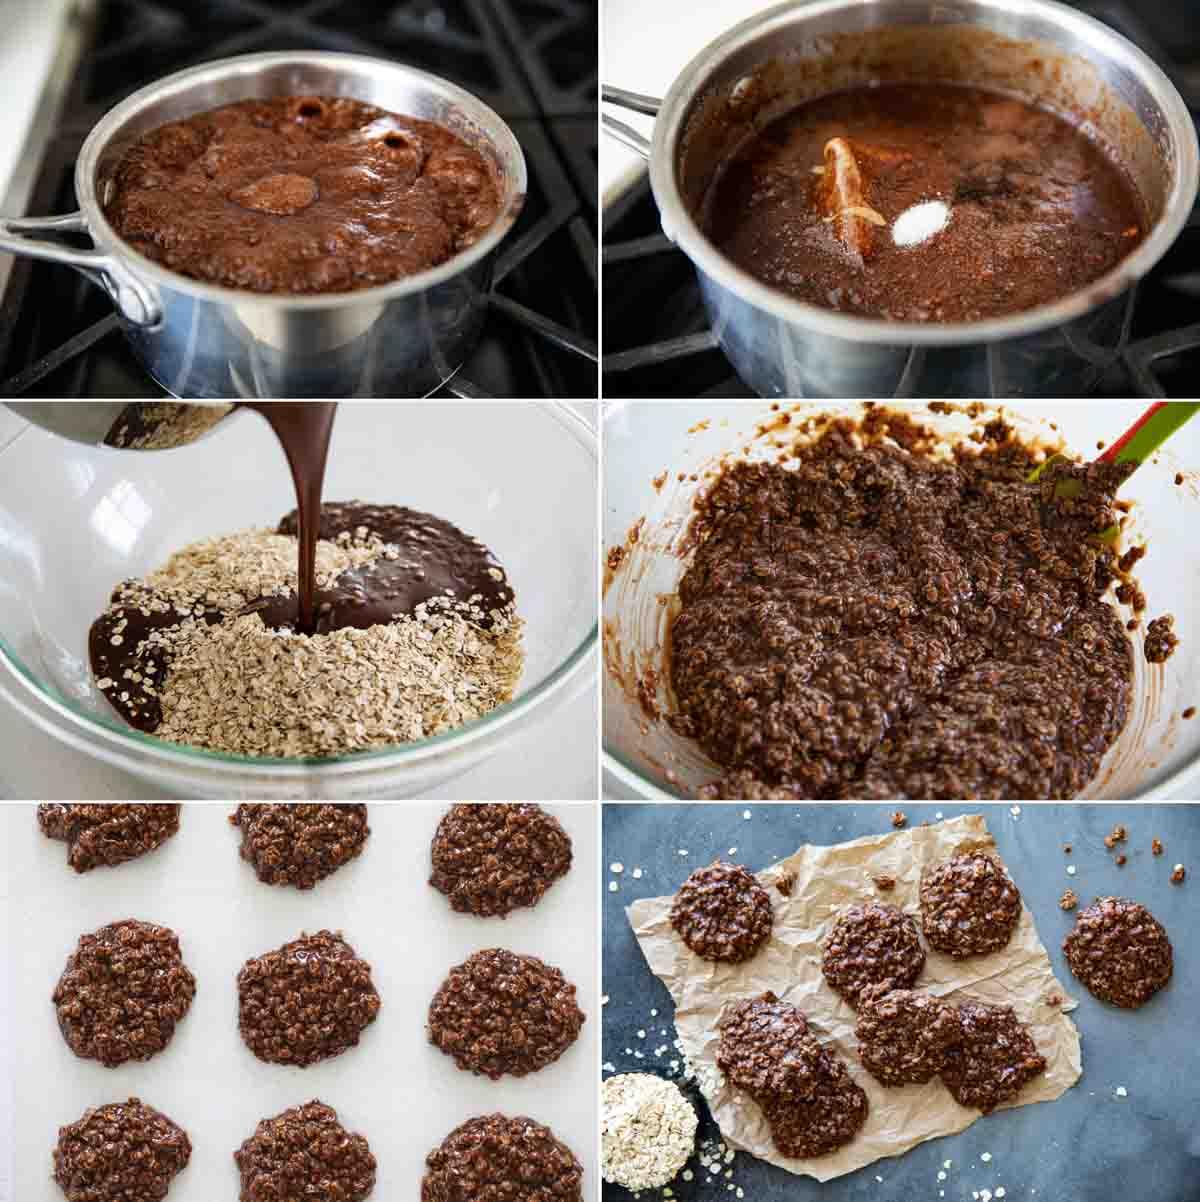 steps to make no bake cookies